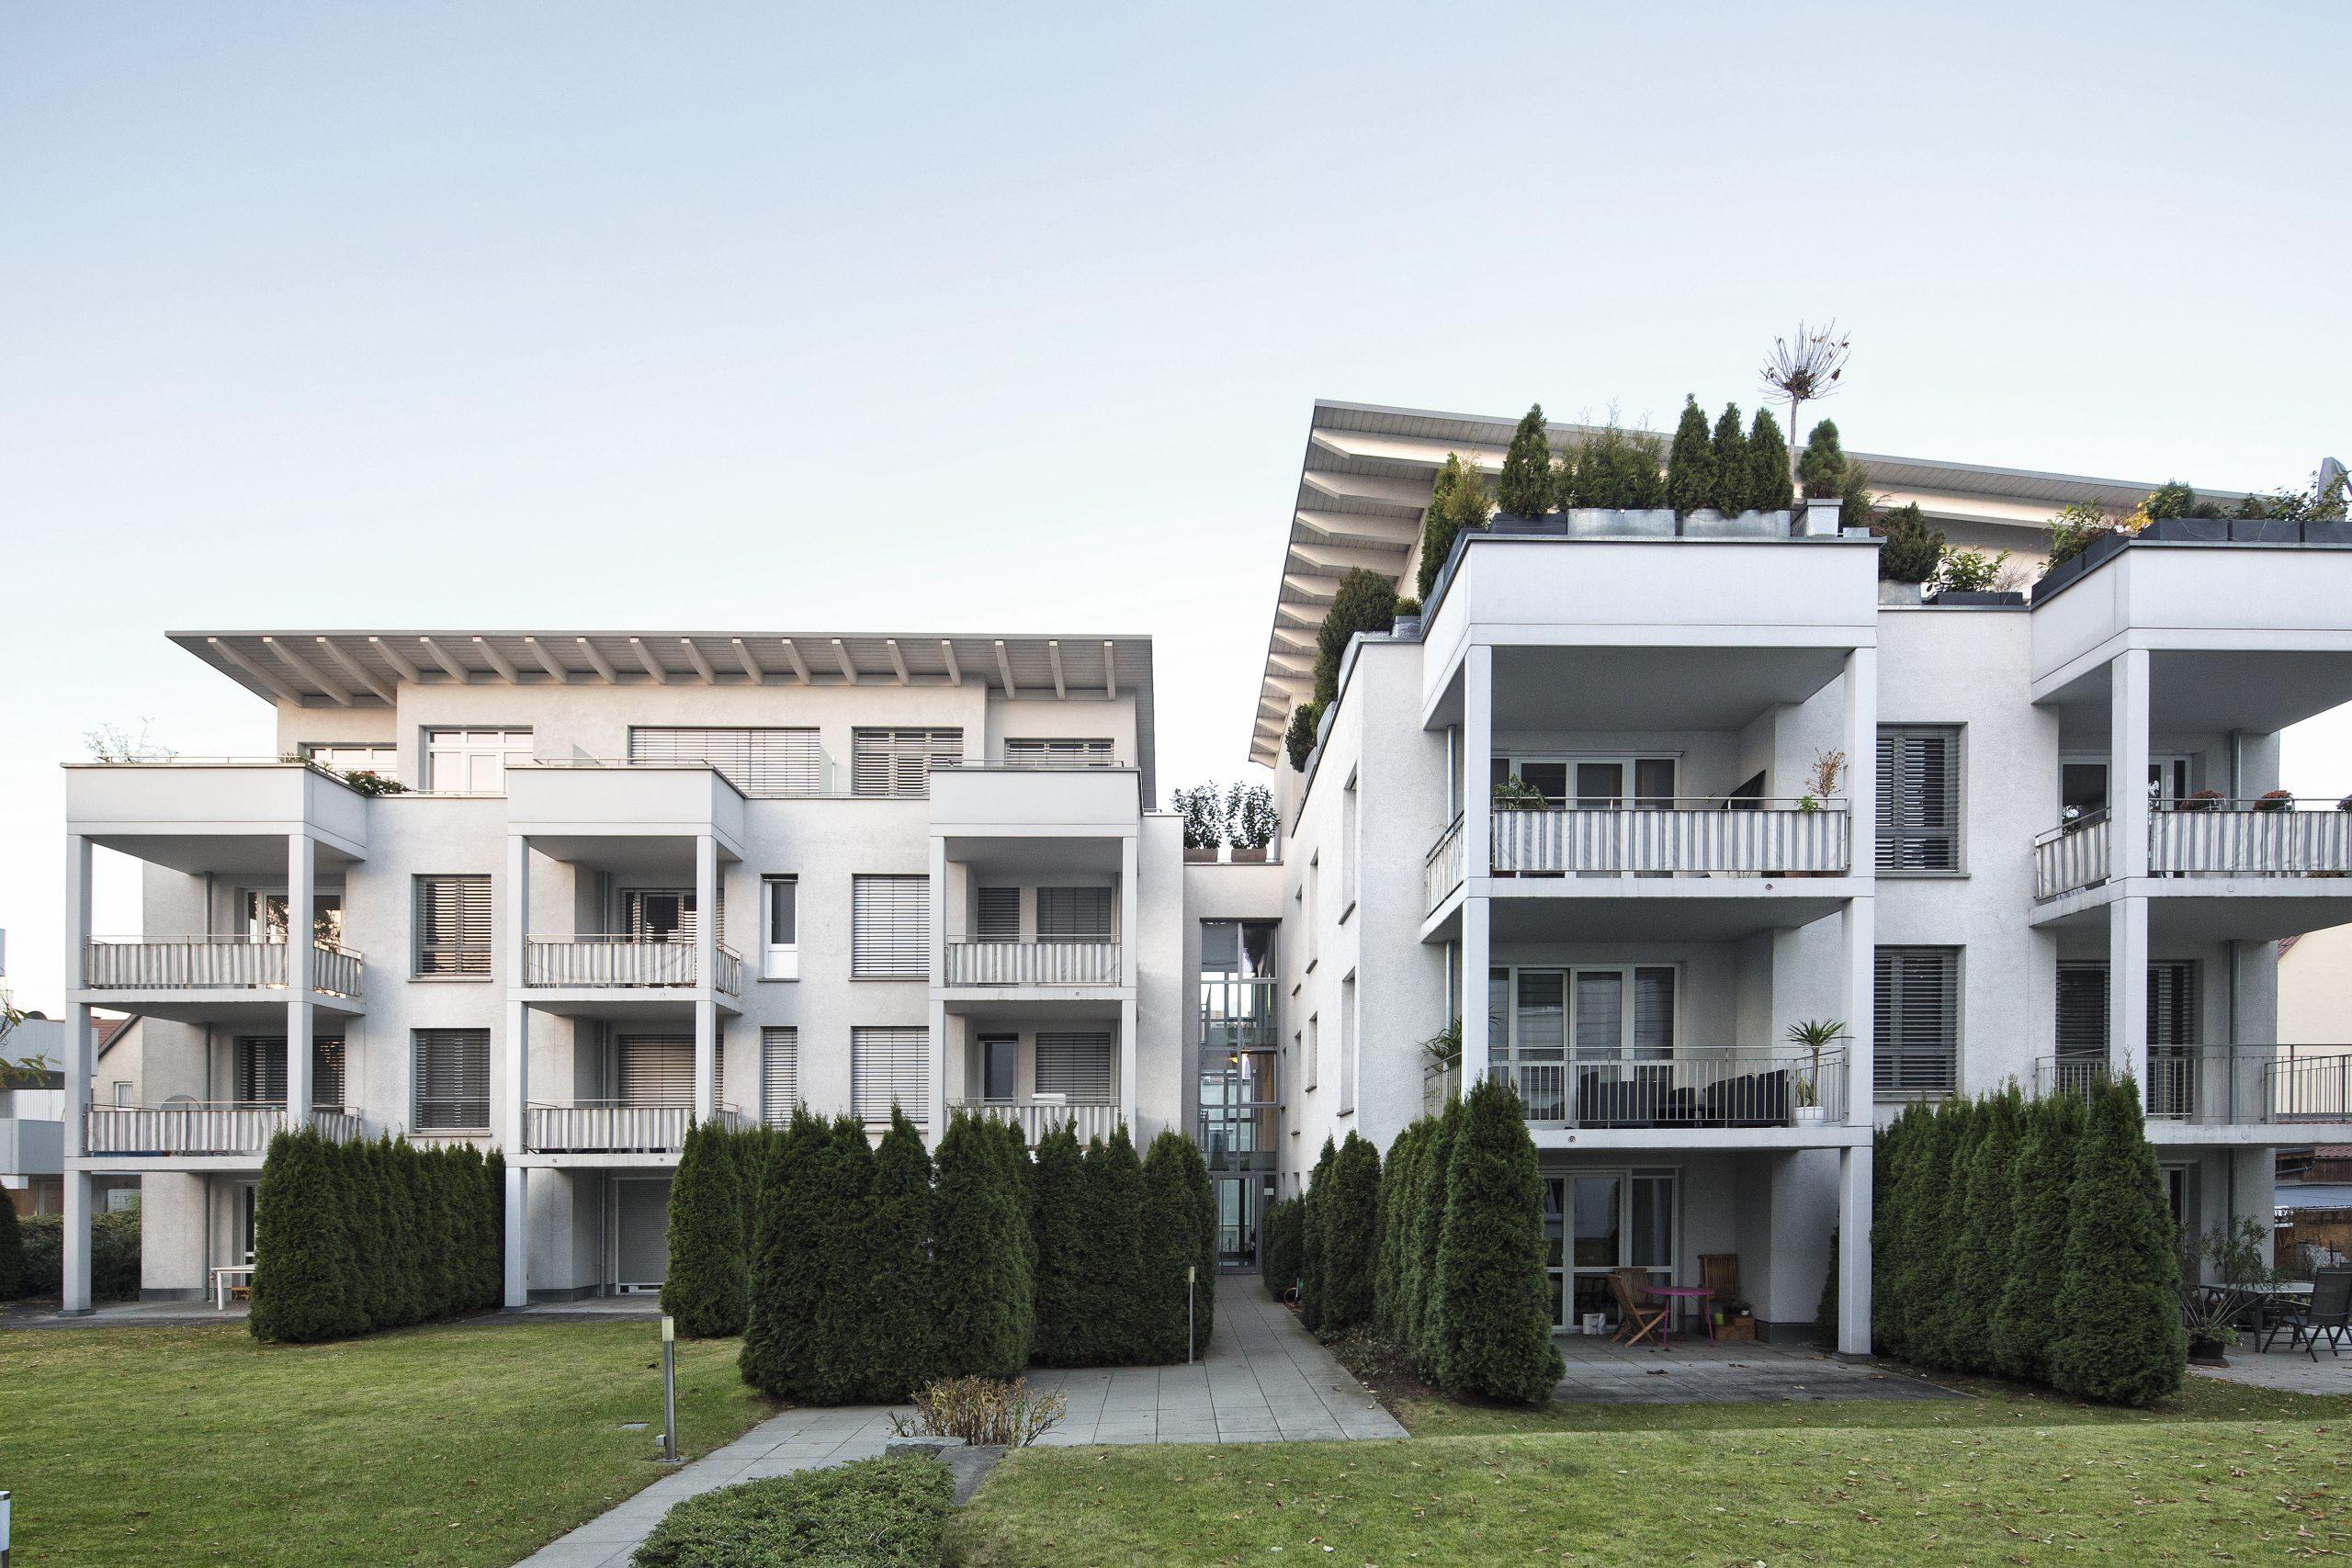 4-Zimmer- Maisonette-Penthousewohnung – Wörthstraße 7/1, Reutlingen